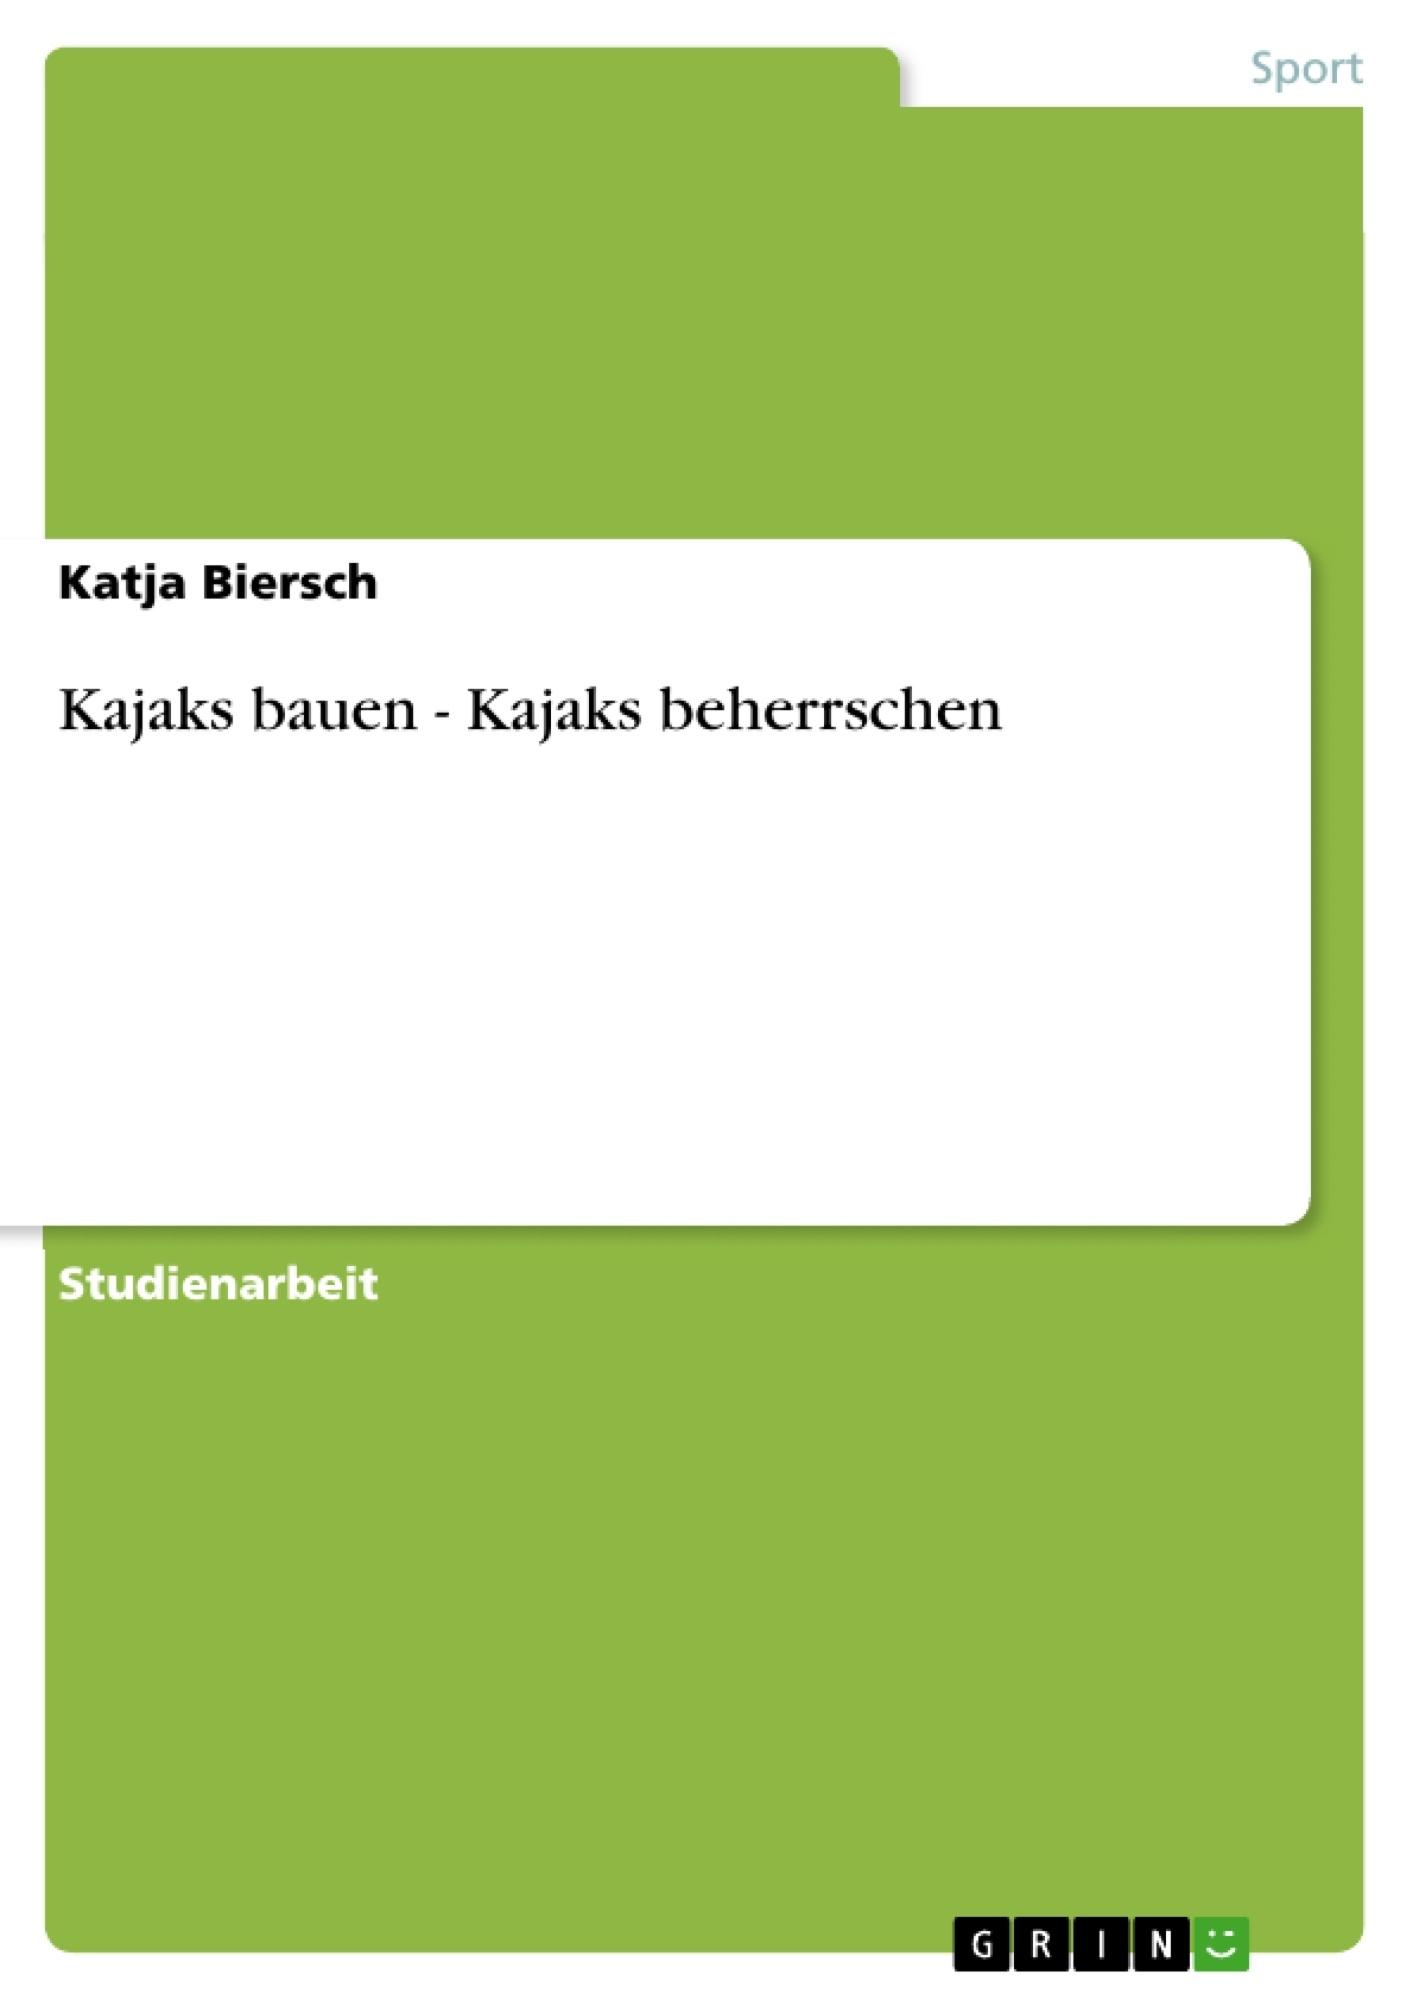 Titel: Kajaks bauen - Kajaks beherrschen